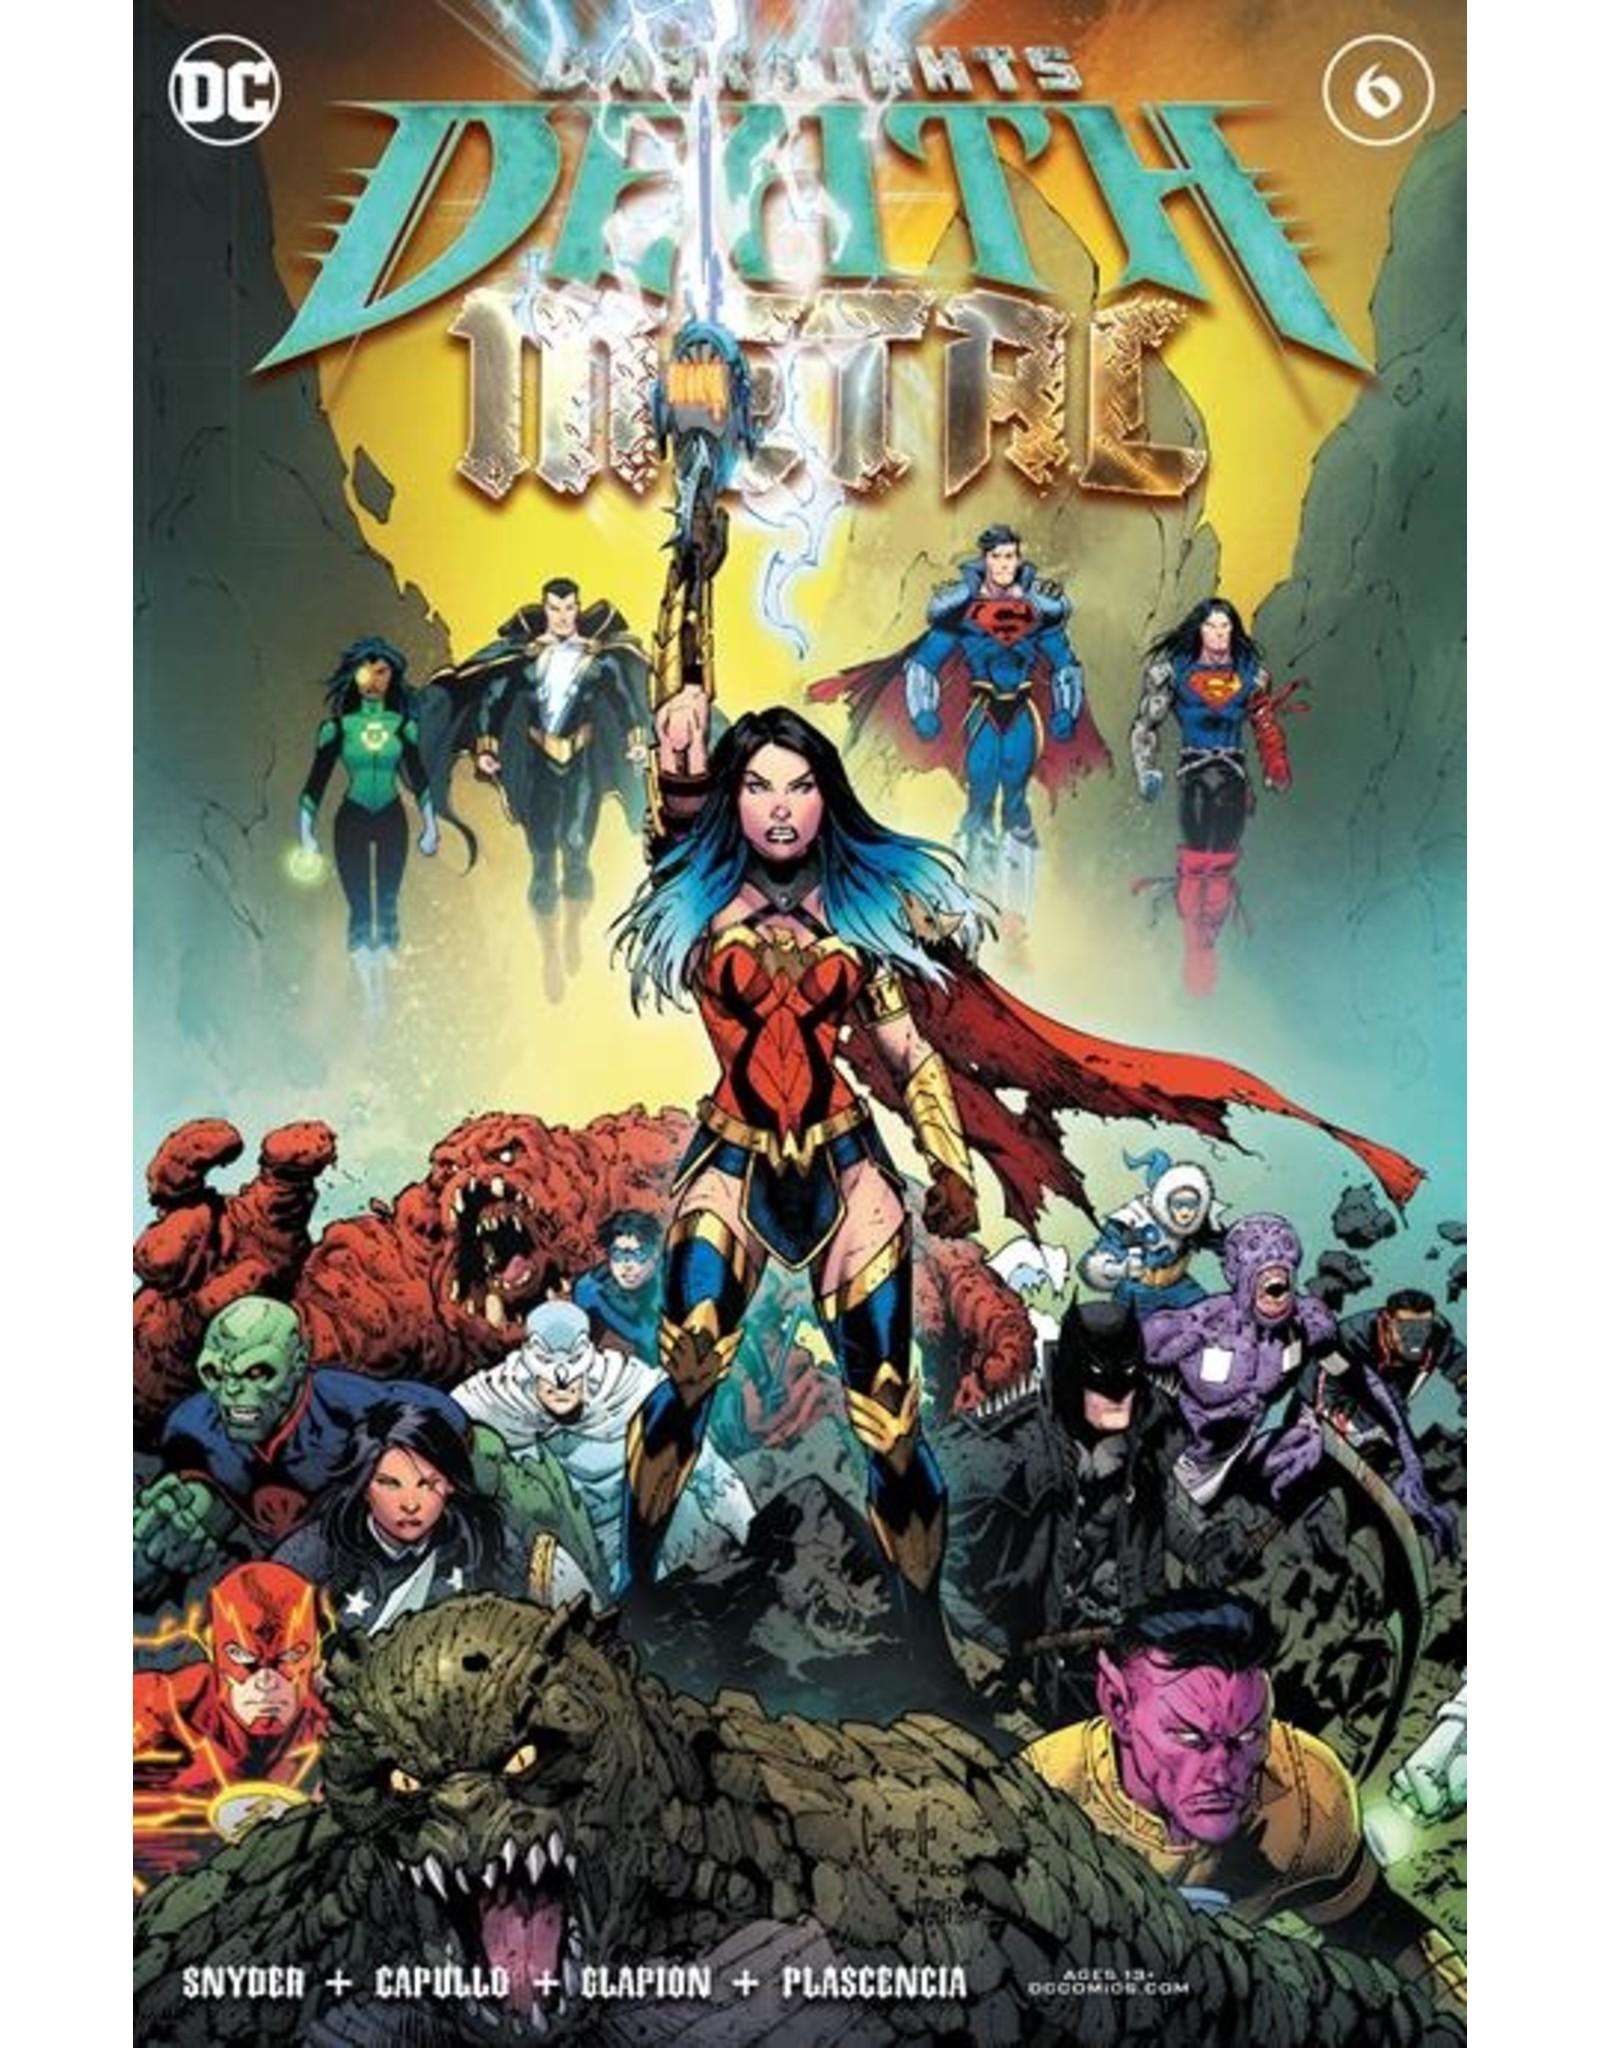 DC COMICS DARK NIGHTS DEATH METAL #6 (OF 7) CVR A GREG CAPULLO FOIL EMBOSSED